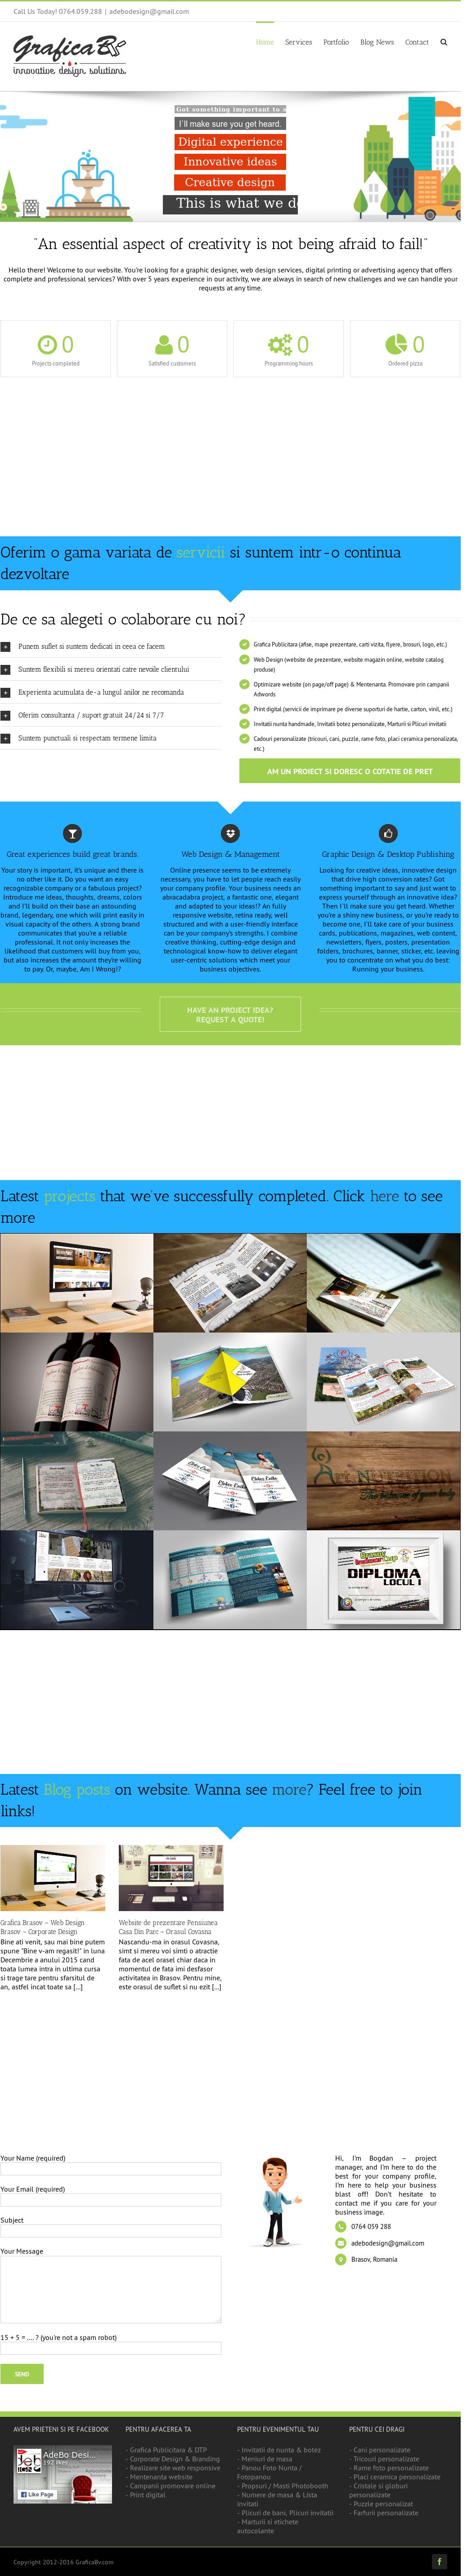 Grafica Publicitara Web Design Competitors Revenue And Employees